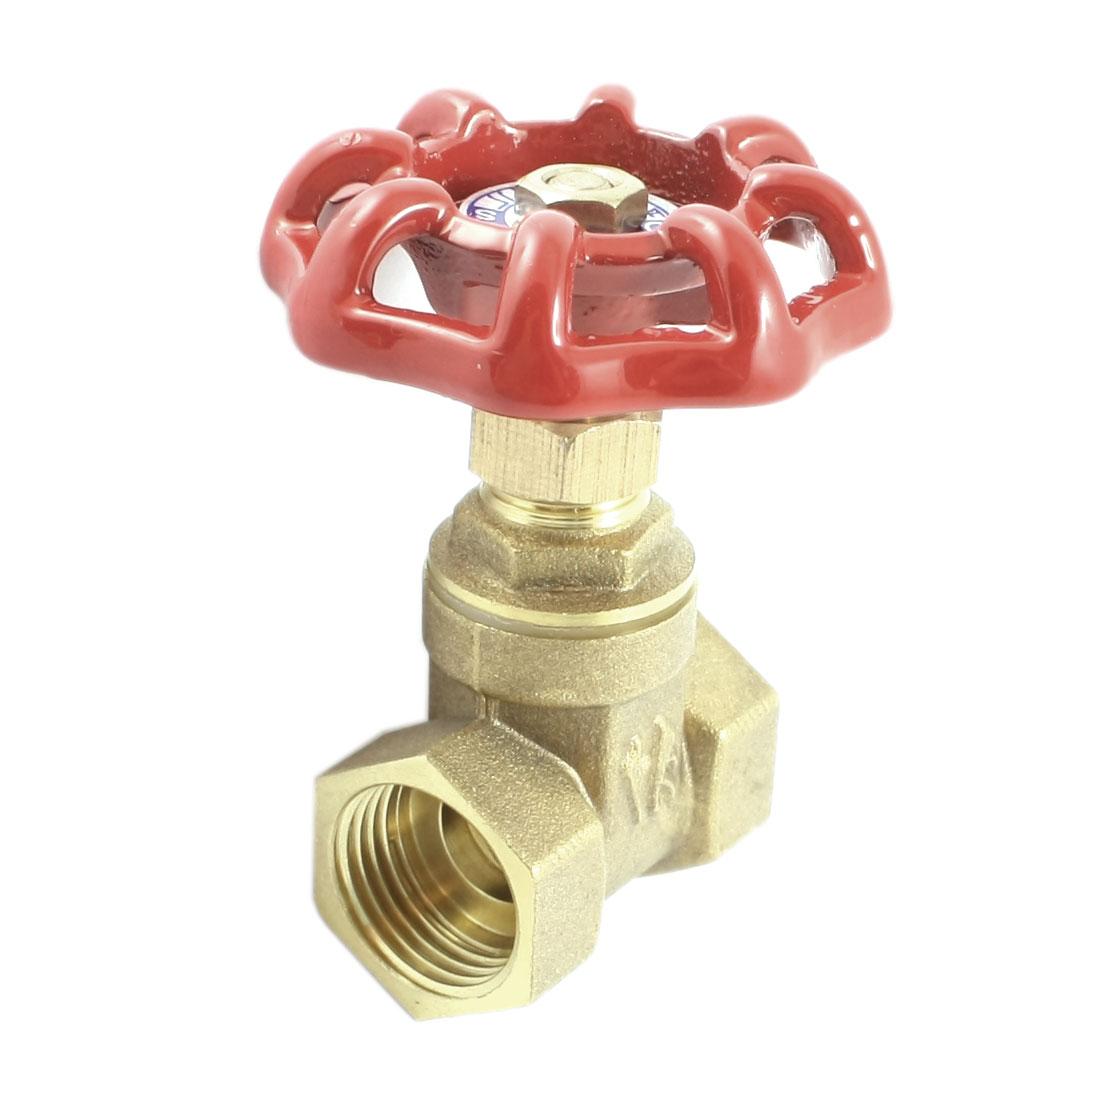 1/2PT 19mm Female Thread Dia Full Port Brass Gas Angle Stop Valve